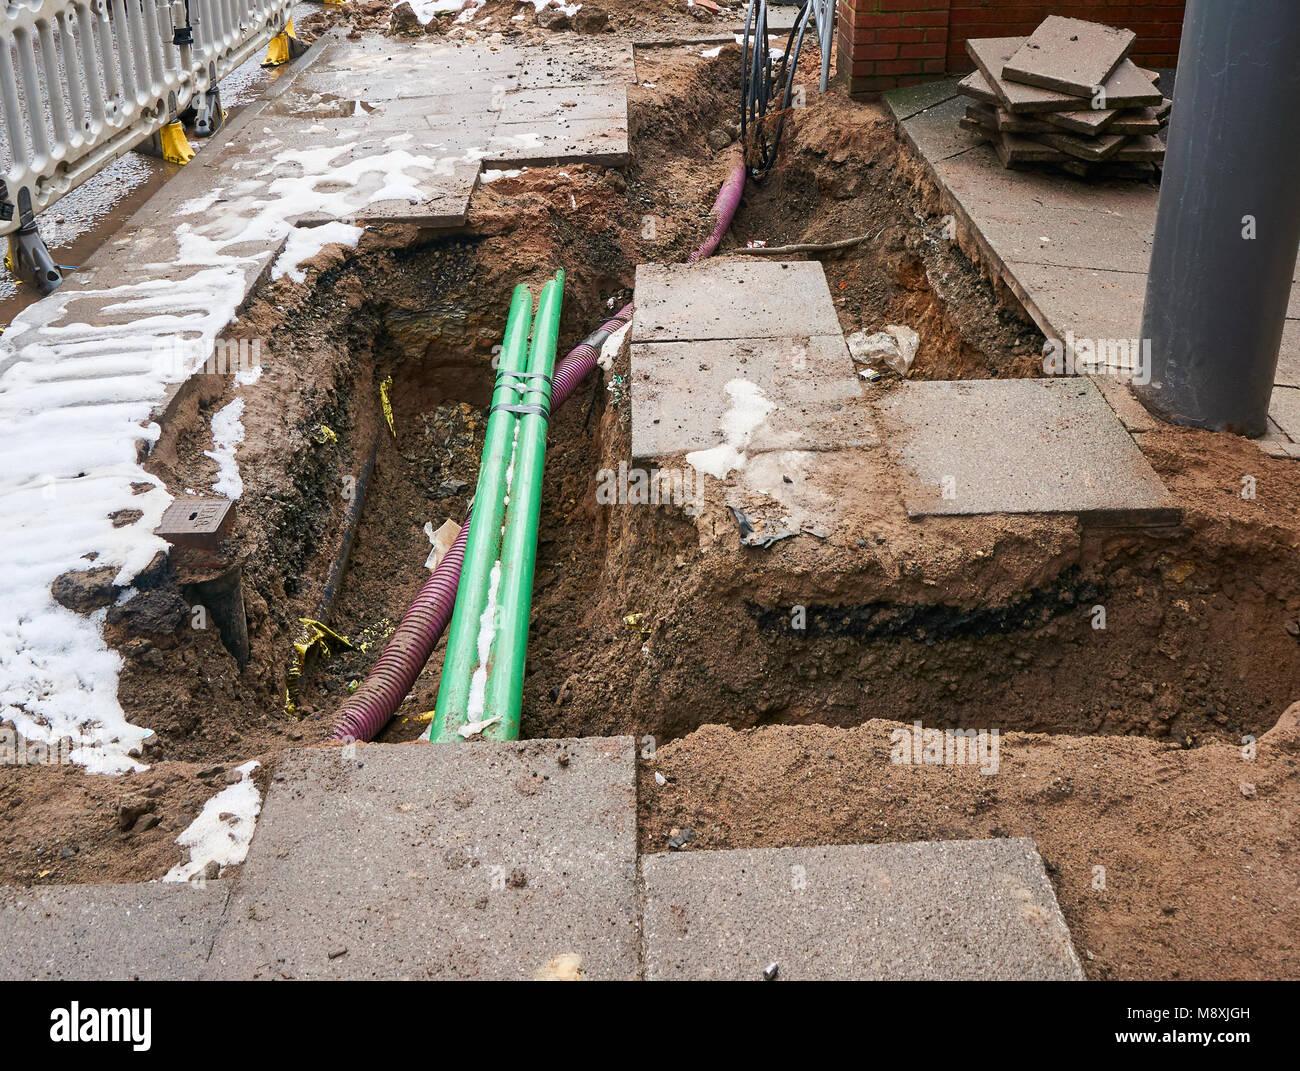 Repair works on underground utilities in Gorbals, Glasgow. - Stock Image